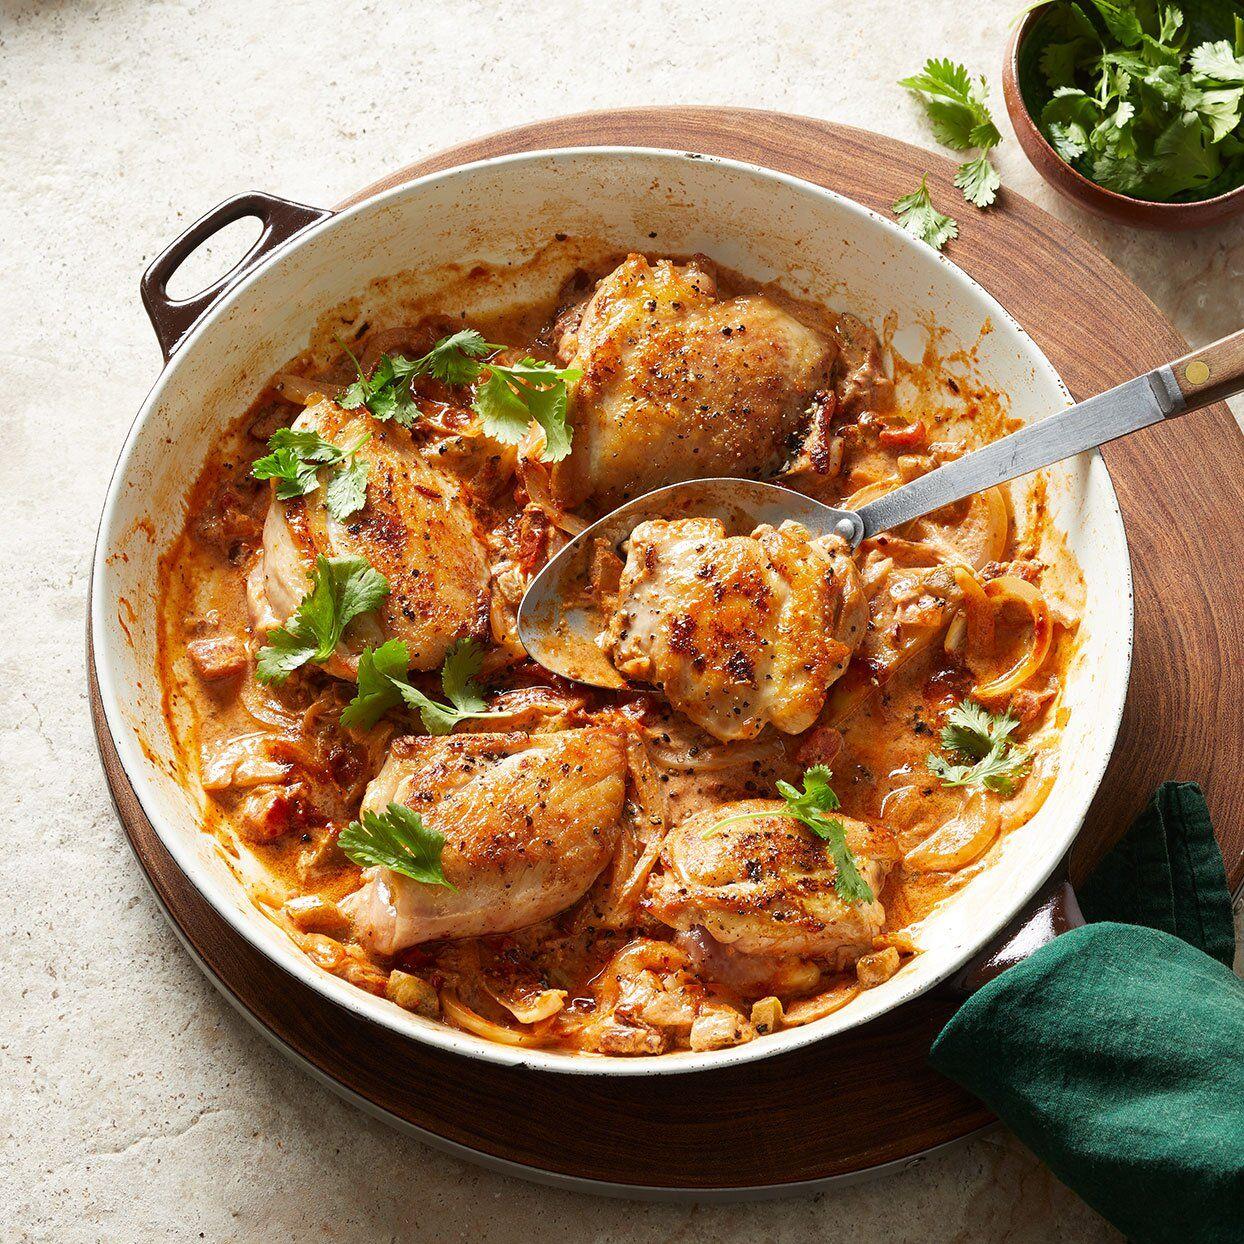 Creamy Chipotle Skillet Chicken Thighs Recipe Skillet Chicken Skillet Chicken Thighs Chicken Recipes